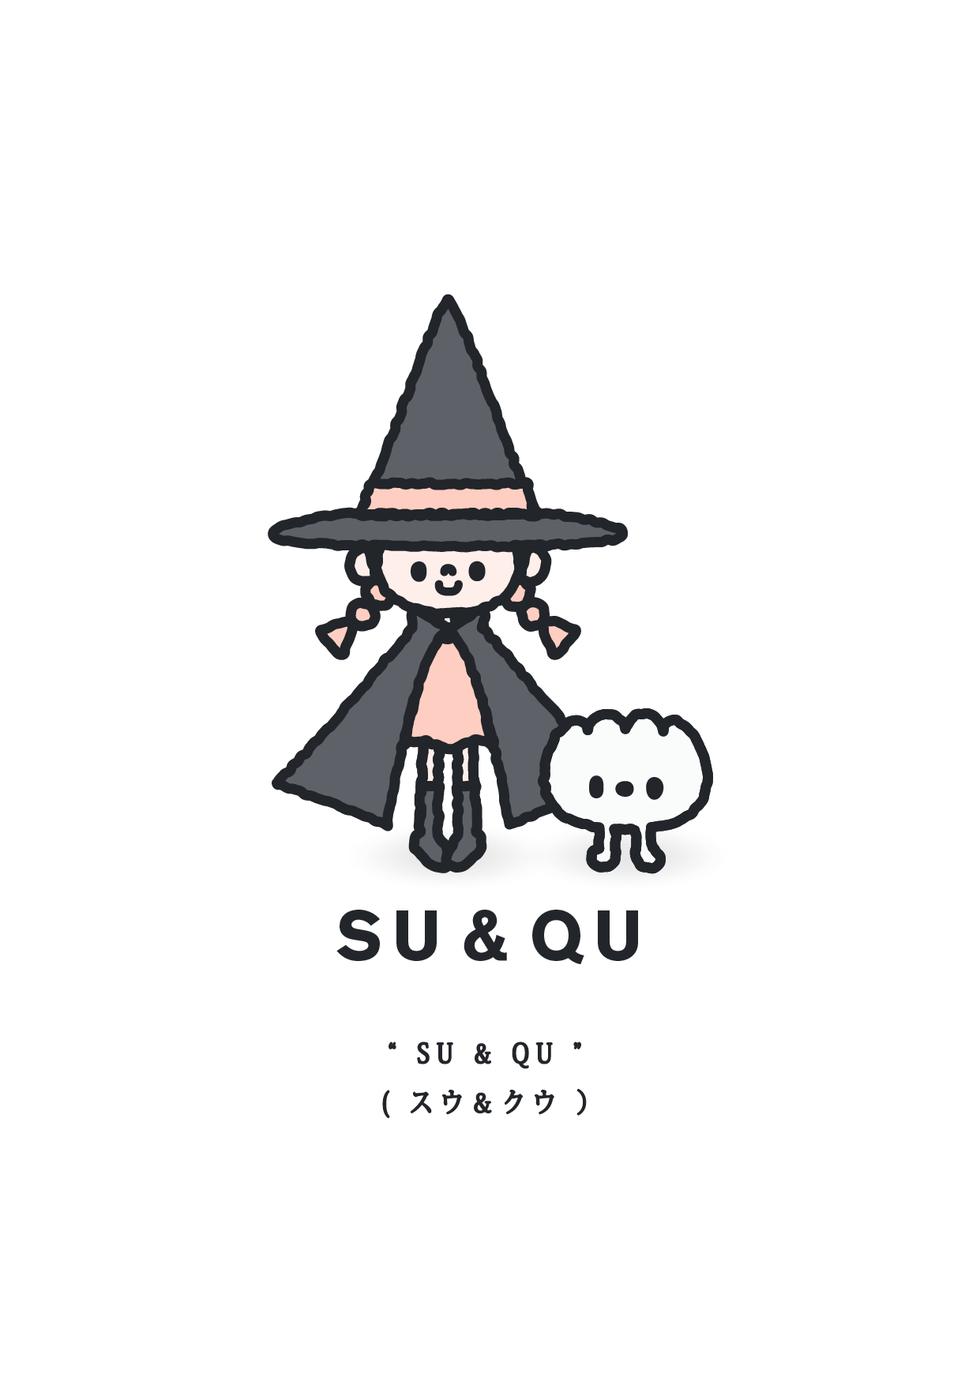 suqqu-present-DATA-04.png